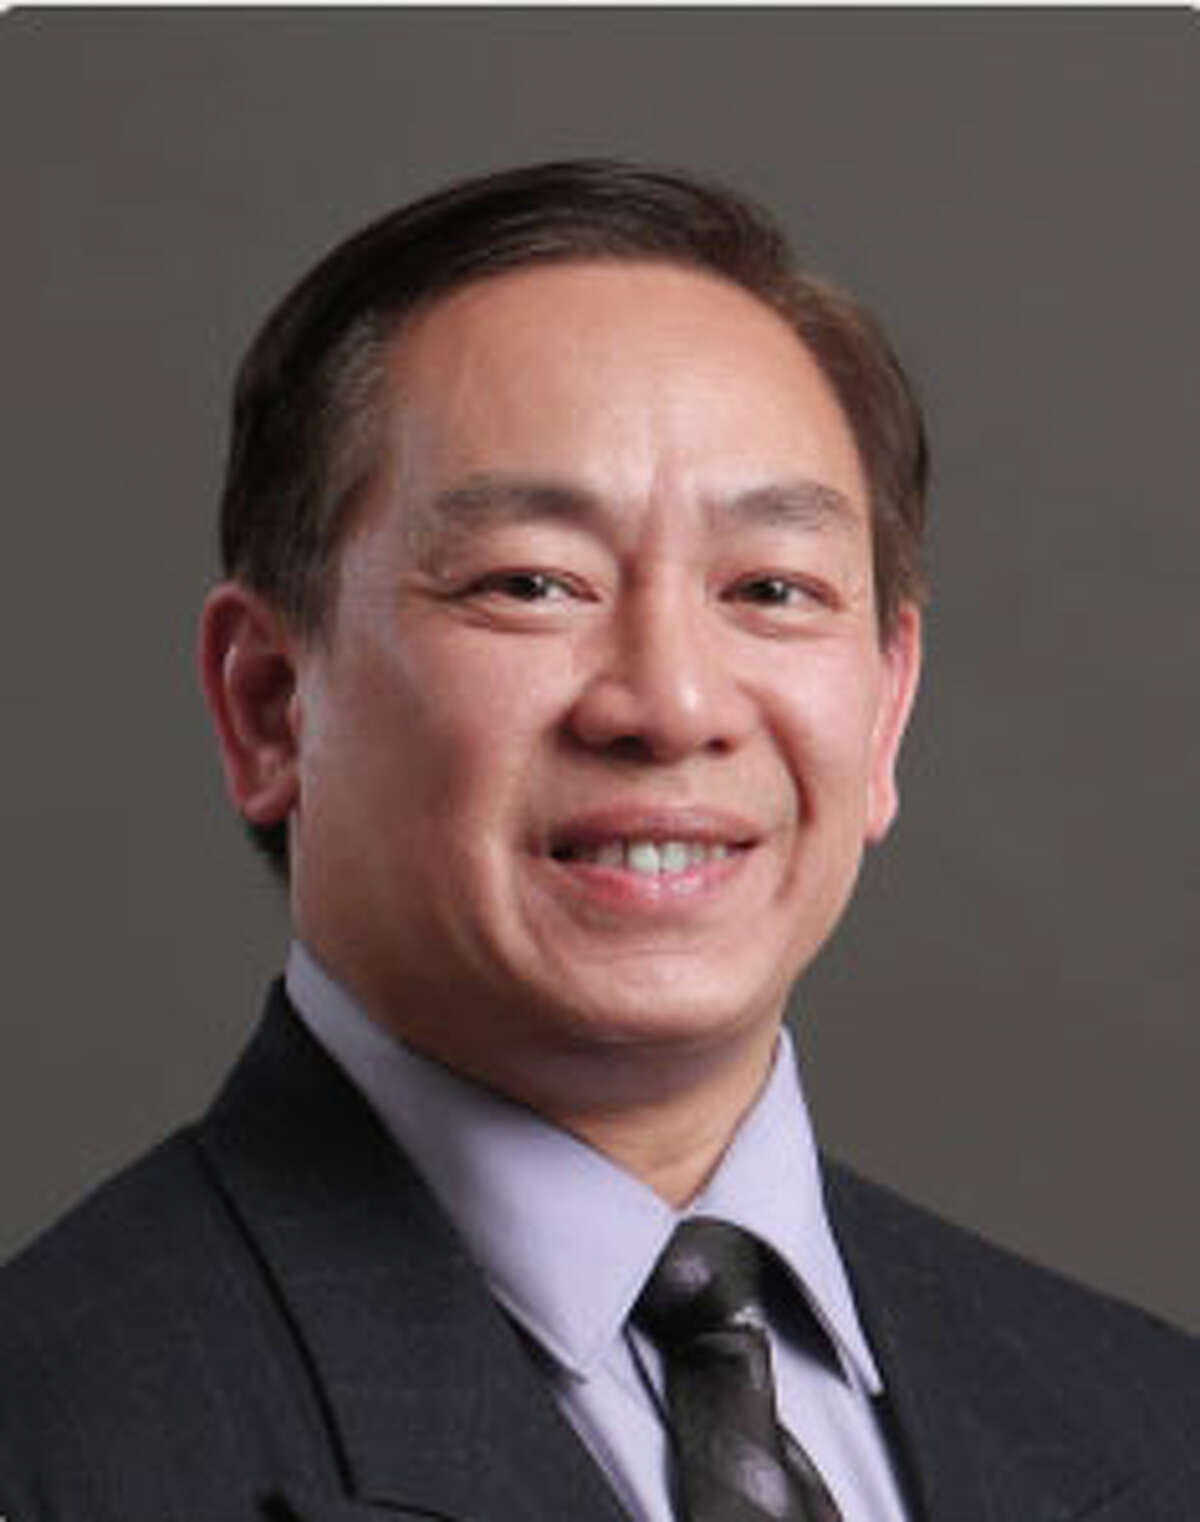 Richard Nguyen Winner of District F.